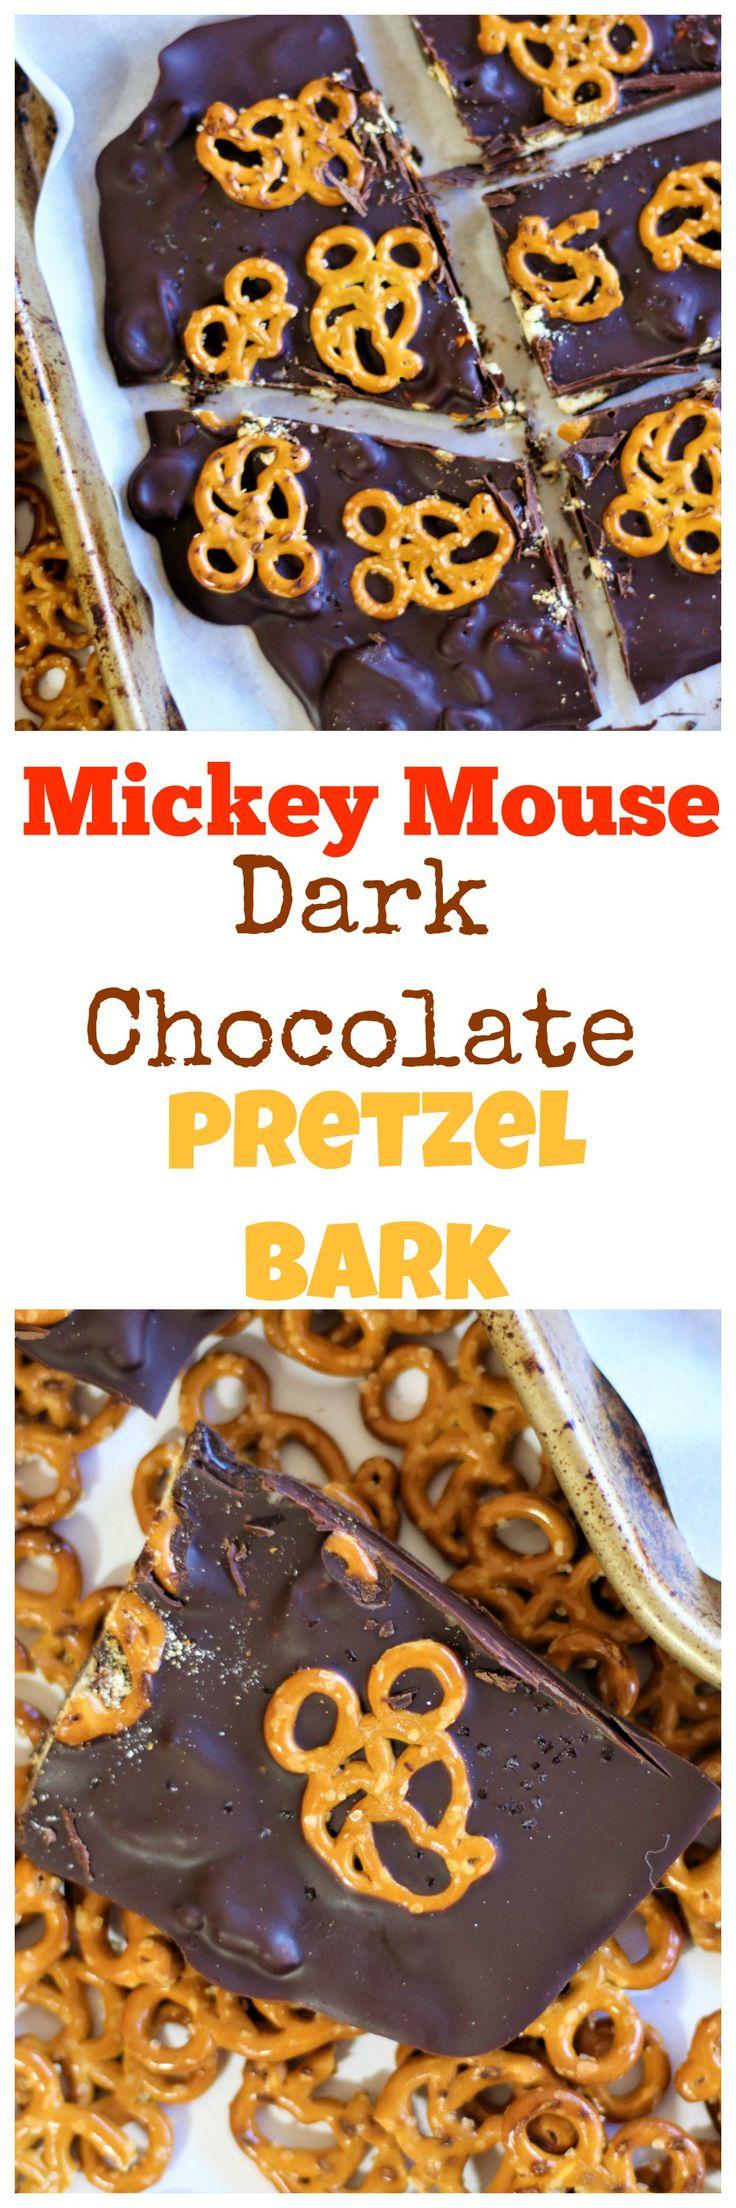 Mickey Dark Chocolate Pretzel Bark - National Pretzel Day - Disney Pretzel - Mickey Shaped Food - Mickey Pretzel - Disney Dessert - Disney Family